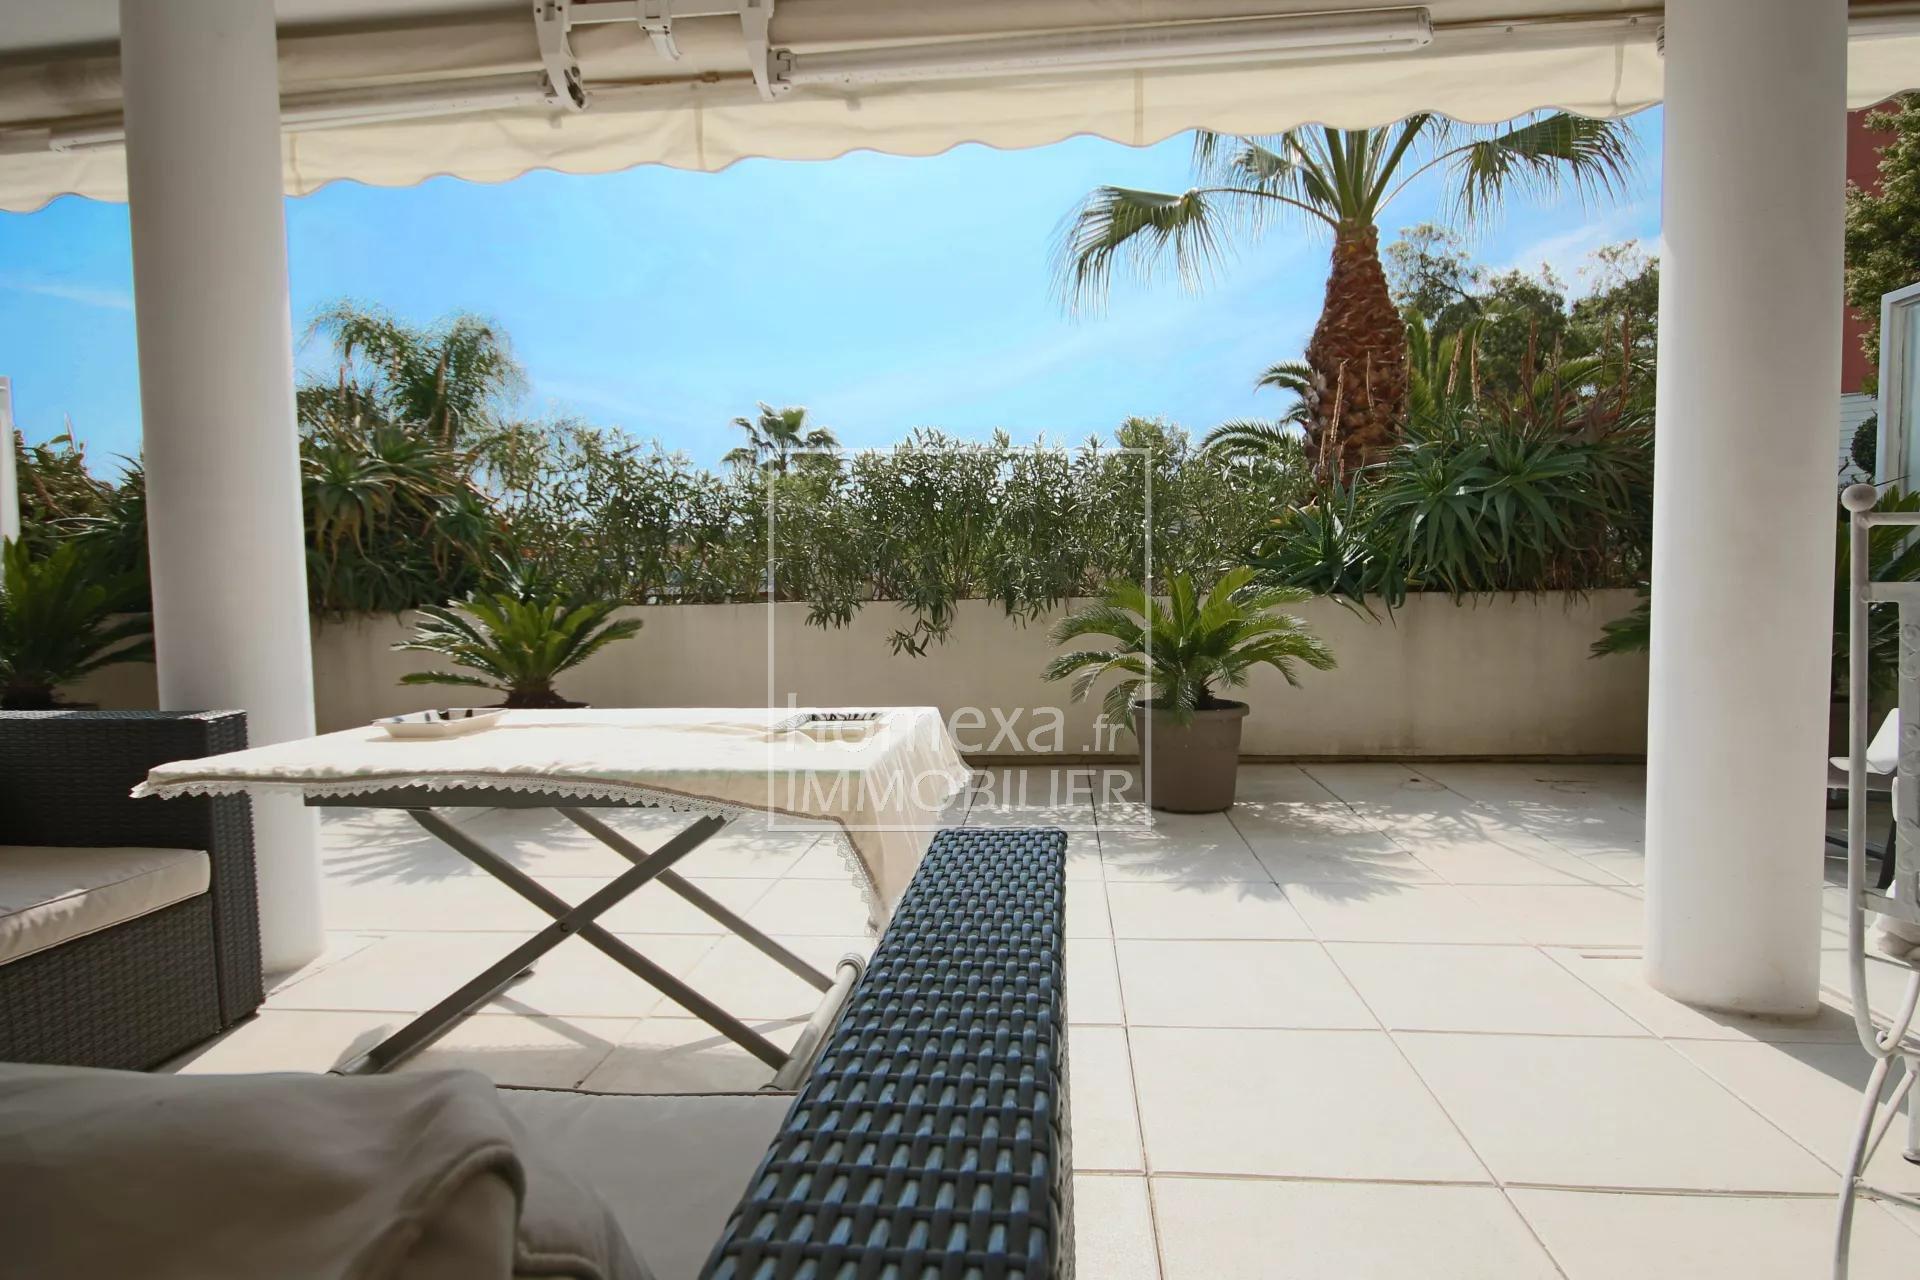 Apartment for sale in Cannes La Bocca : Terrace view